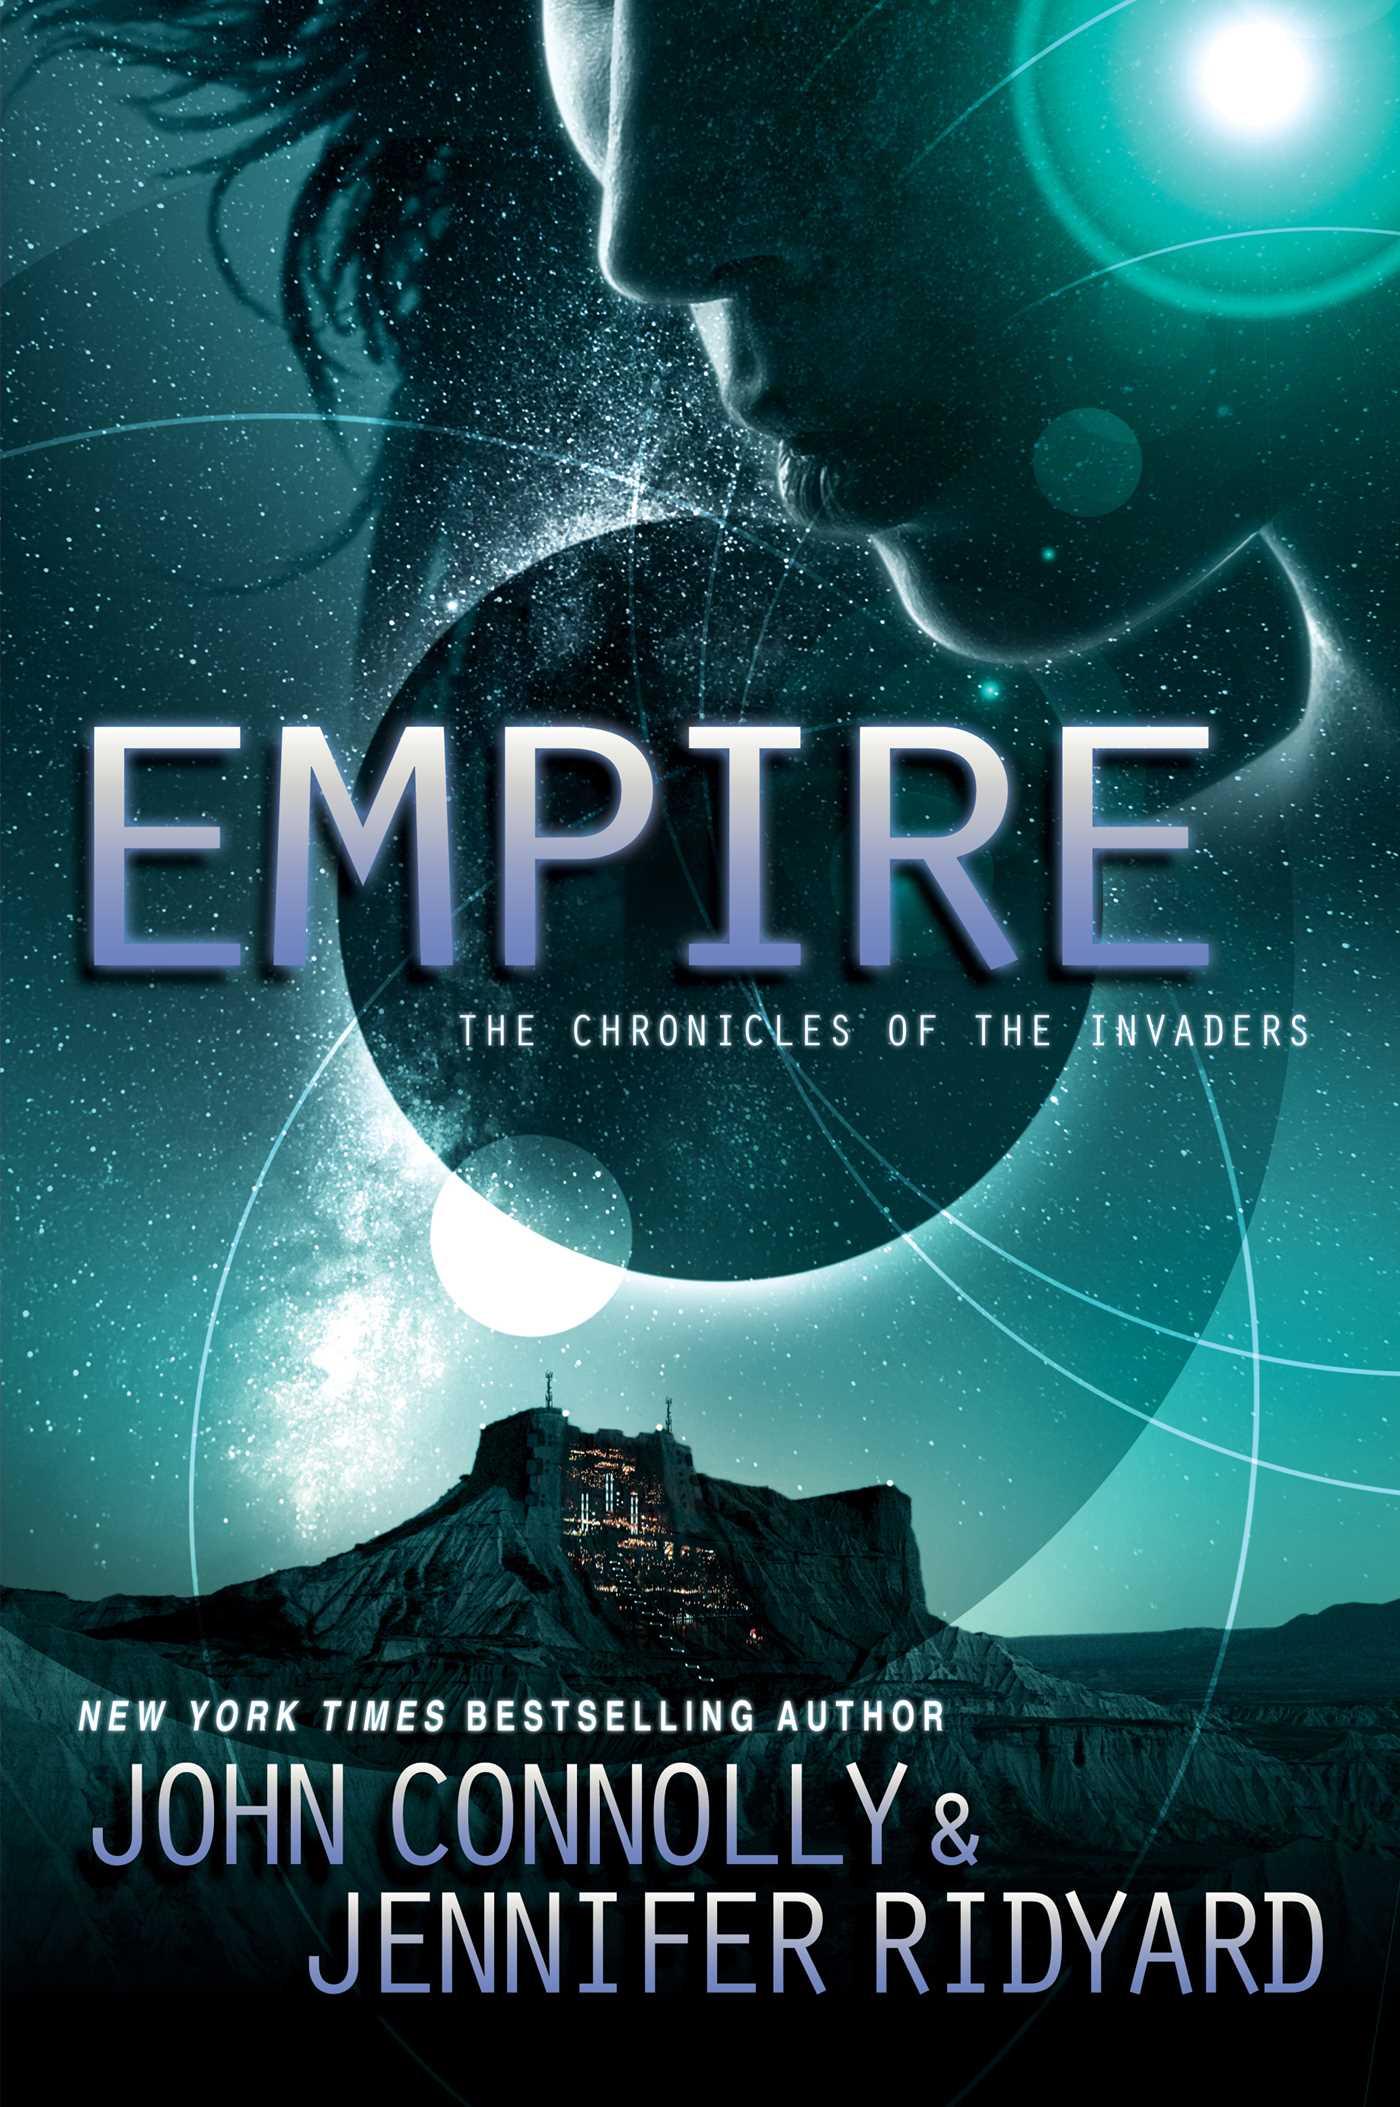 Empire 9781476757155 hr